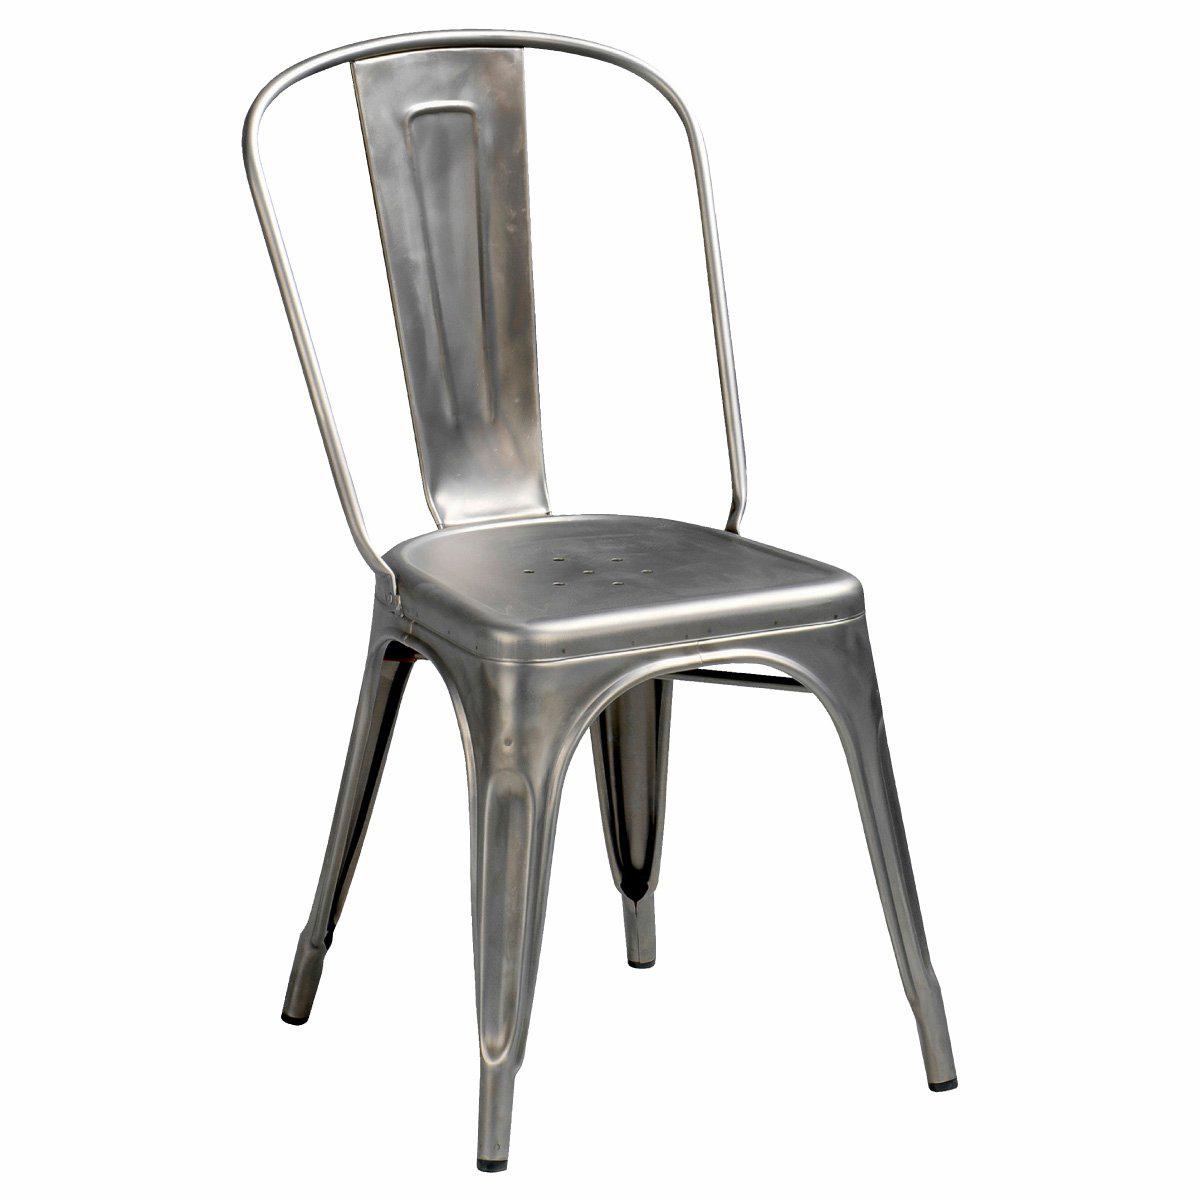 chaise industrielle pas cher. Black Bedroom Furniture Sets. Home Design Ideas